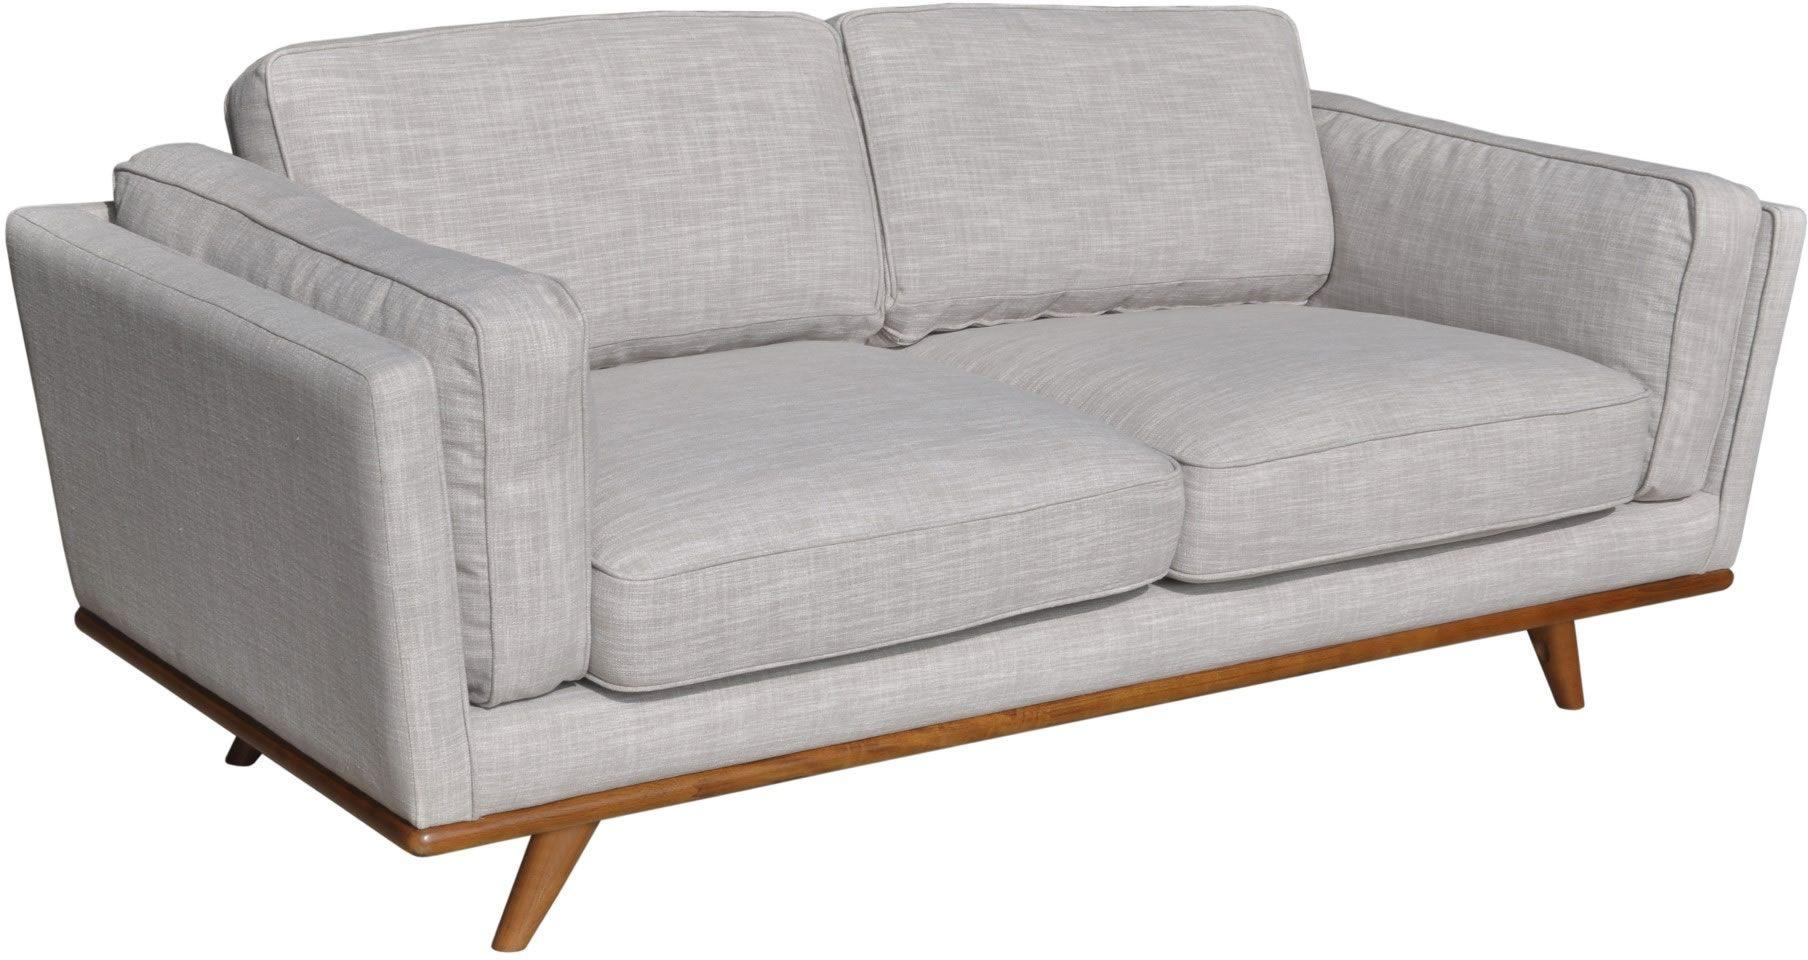 aria fabric modern sectional sofa set roxanne 6 piece modular eclectic lh imports las vegas 2 5 austria